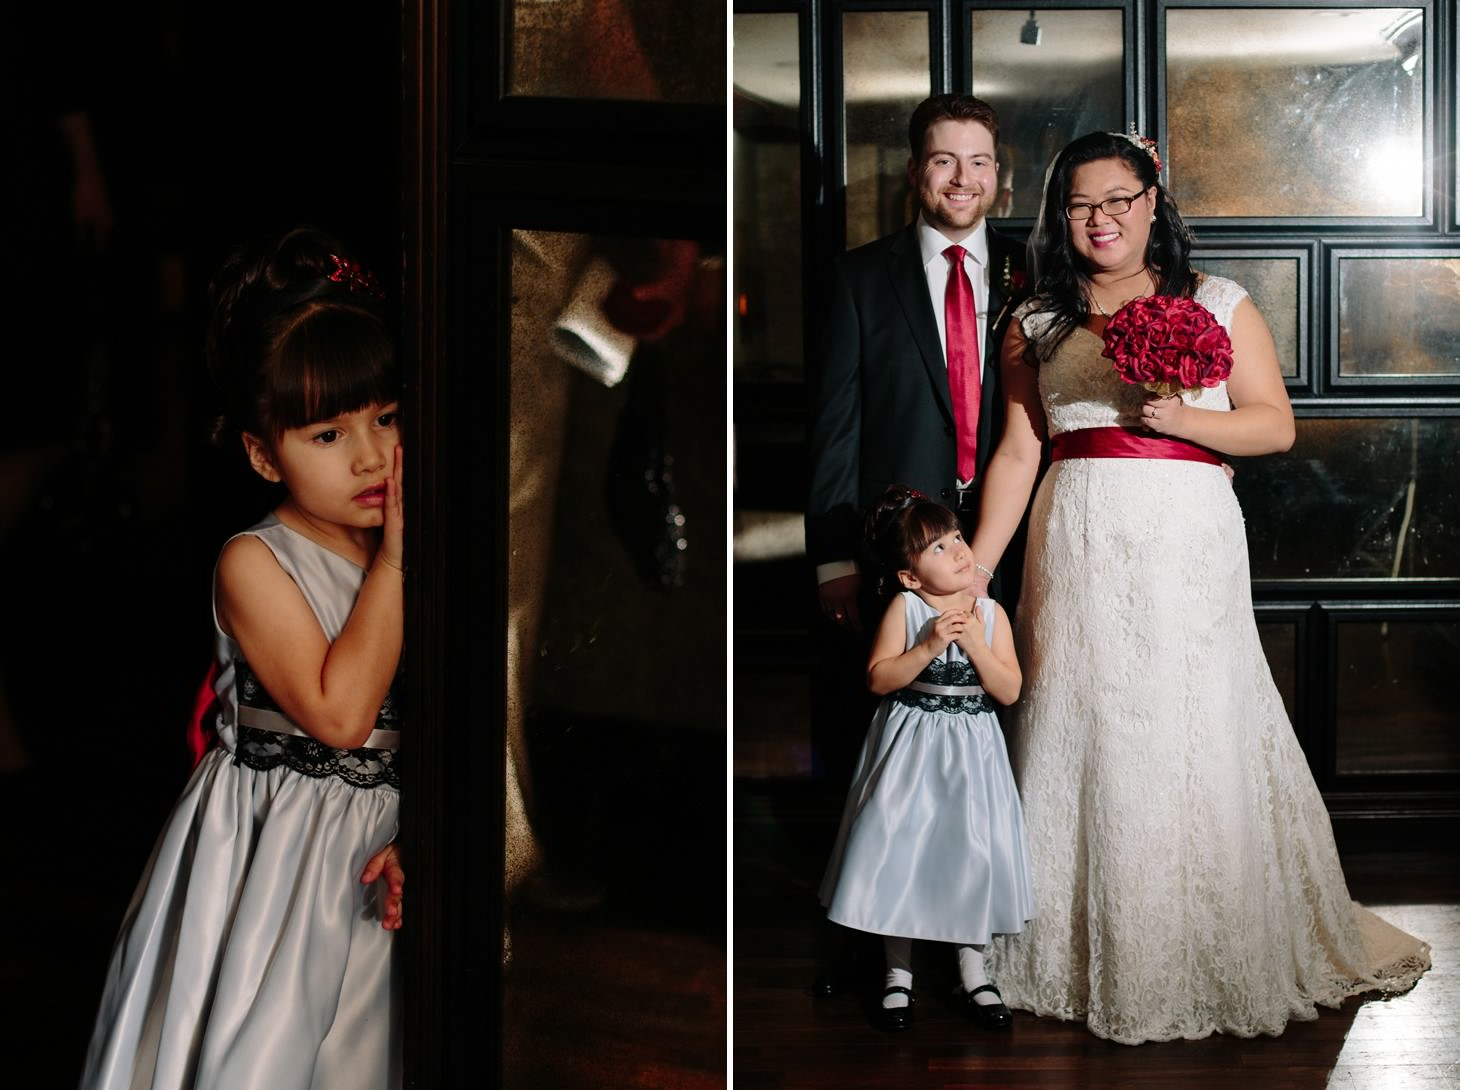 029-nyc-wedding-portrait-photographer-times-square-muse-hotel-winter-wedding-smitten-chickens.jpg